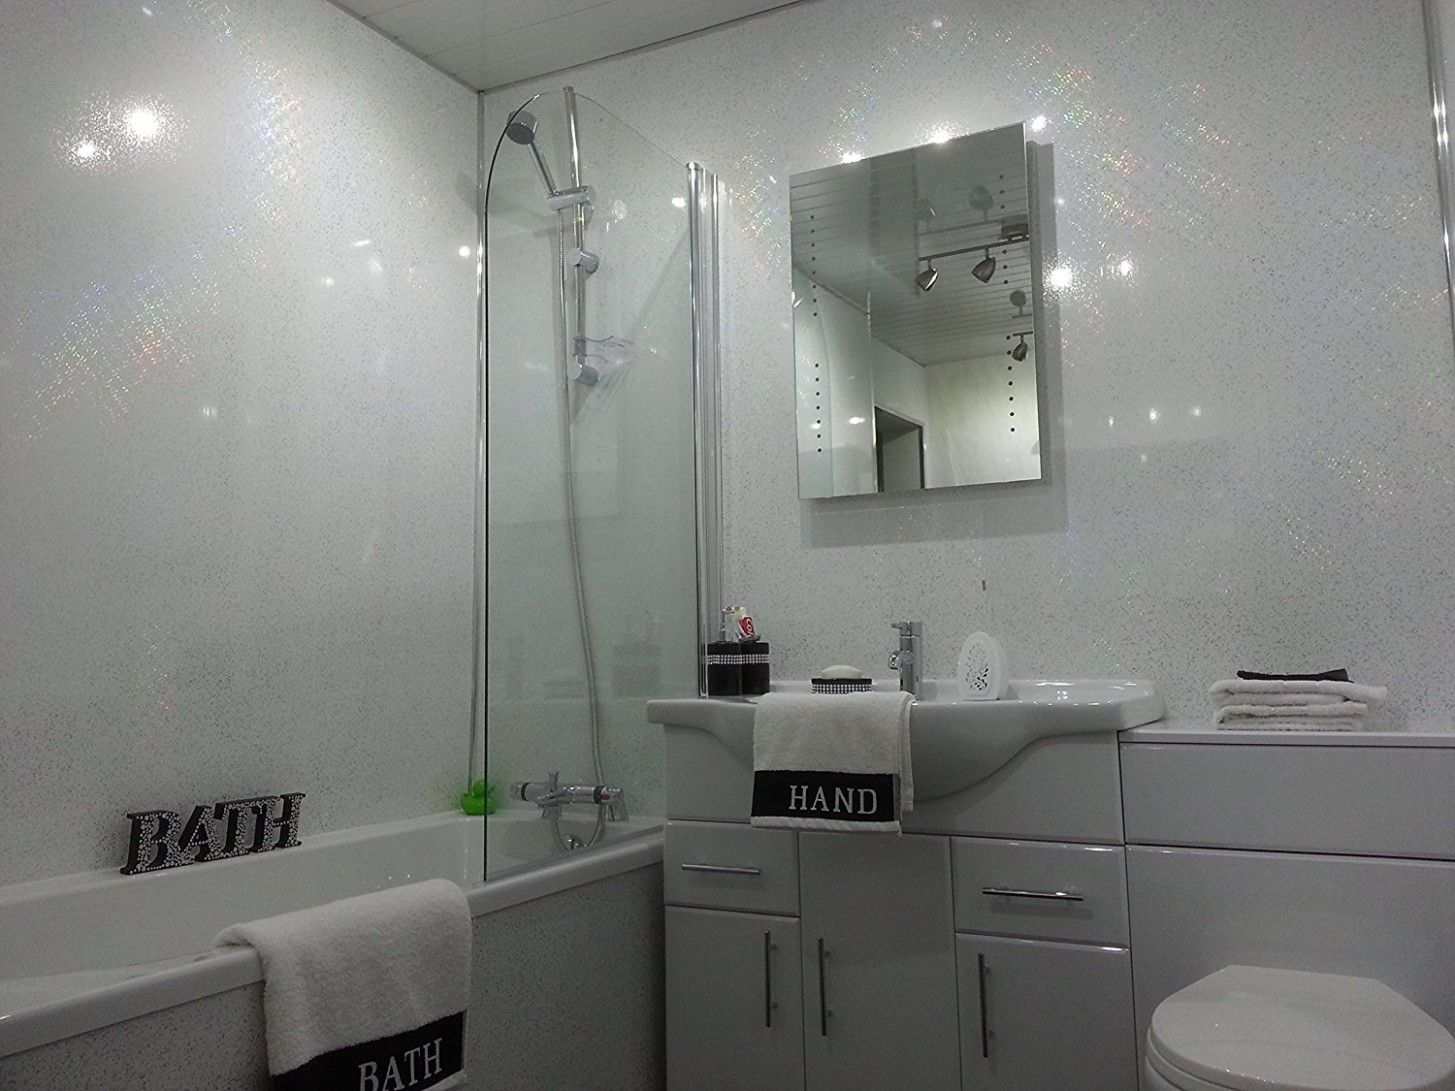 Bathroom Wall Tiles Homebase Design your own bathroom